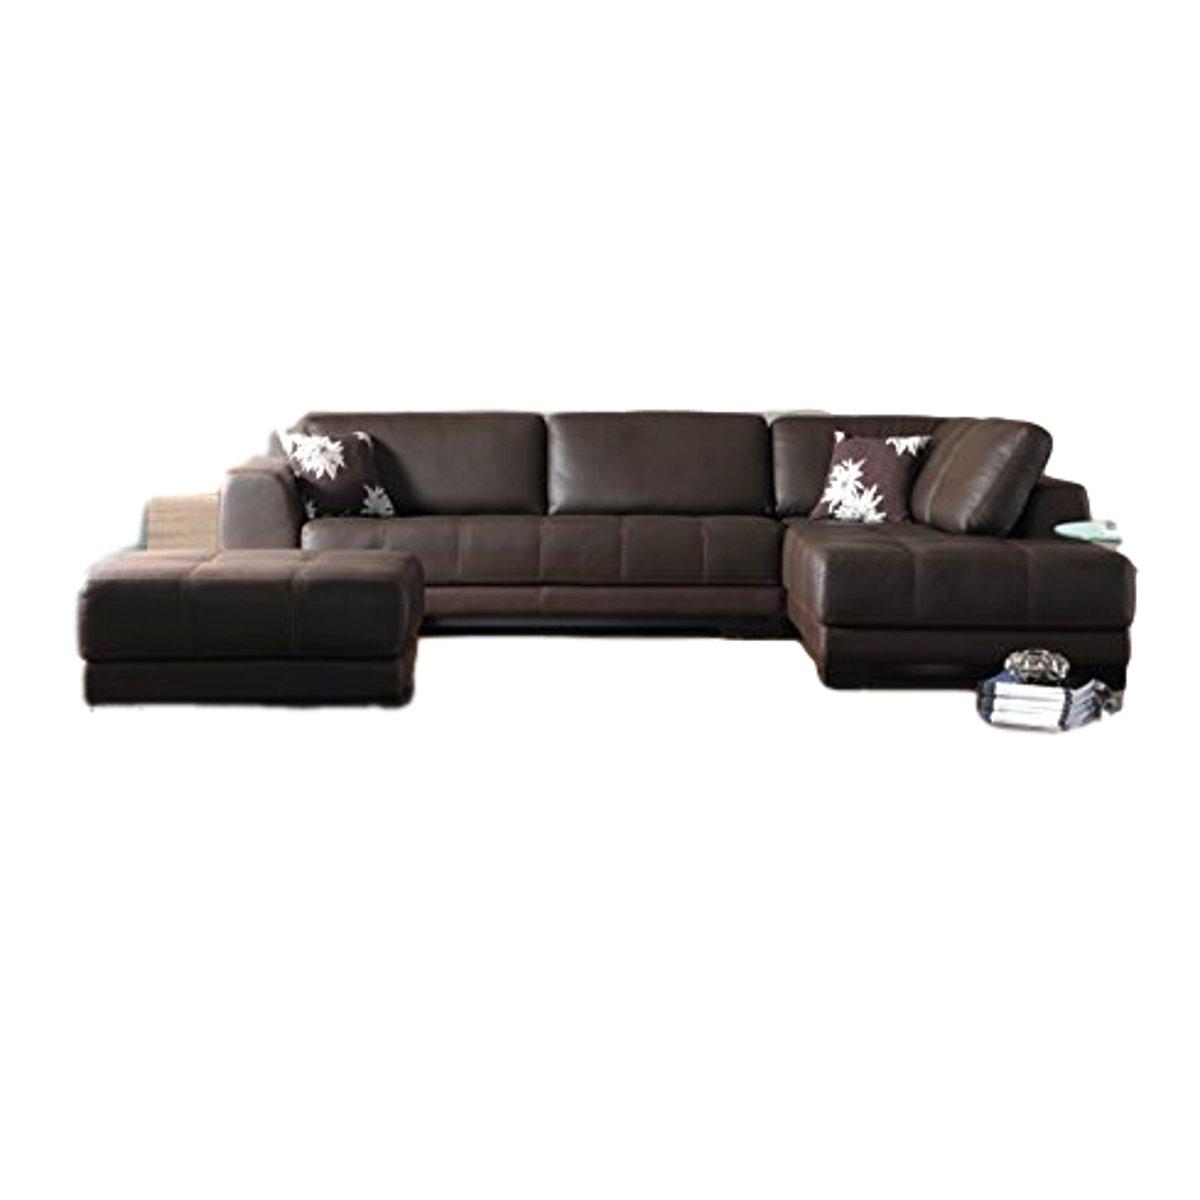 Sofas hub Brown Leather 5 Seater Sofa Set